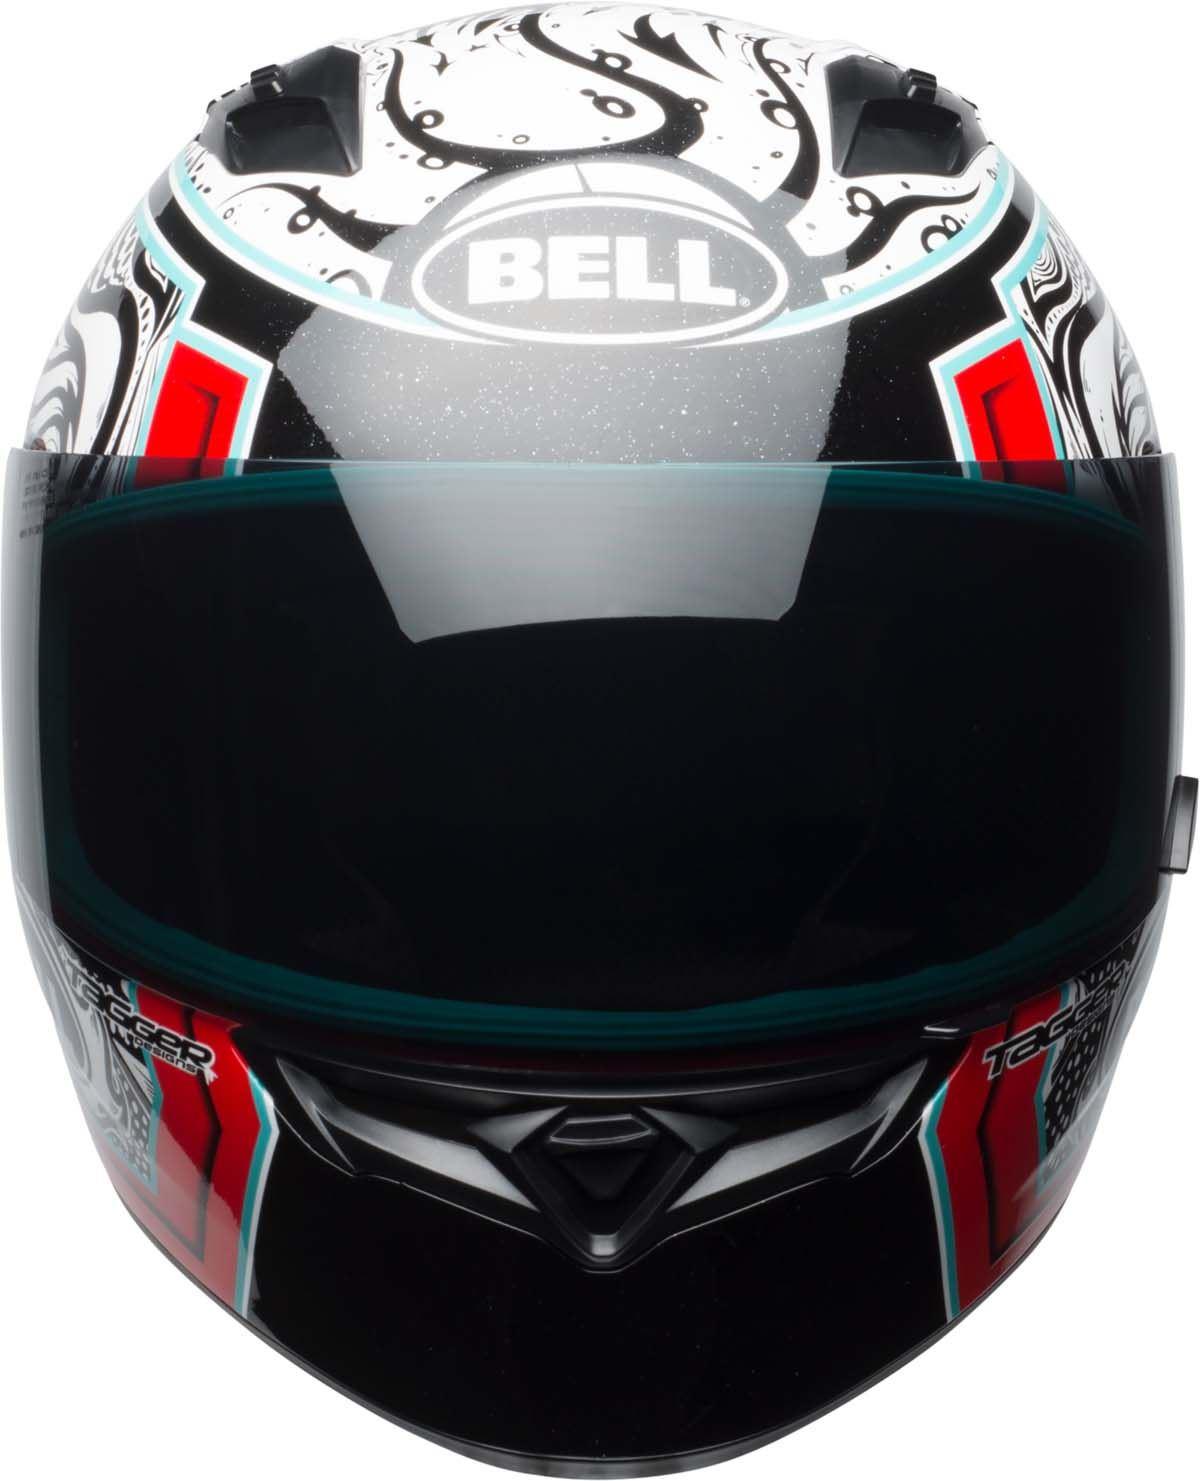 Bell-Qualifier-Helmet-Full-Face-Motorcycle-Clear-Shield-DOT-XS-3XL miniature 47